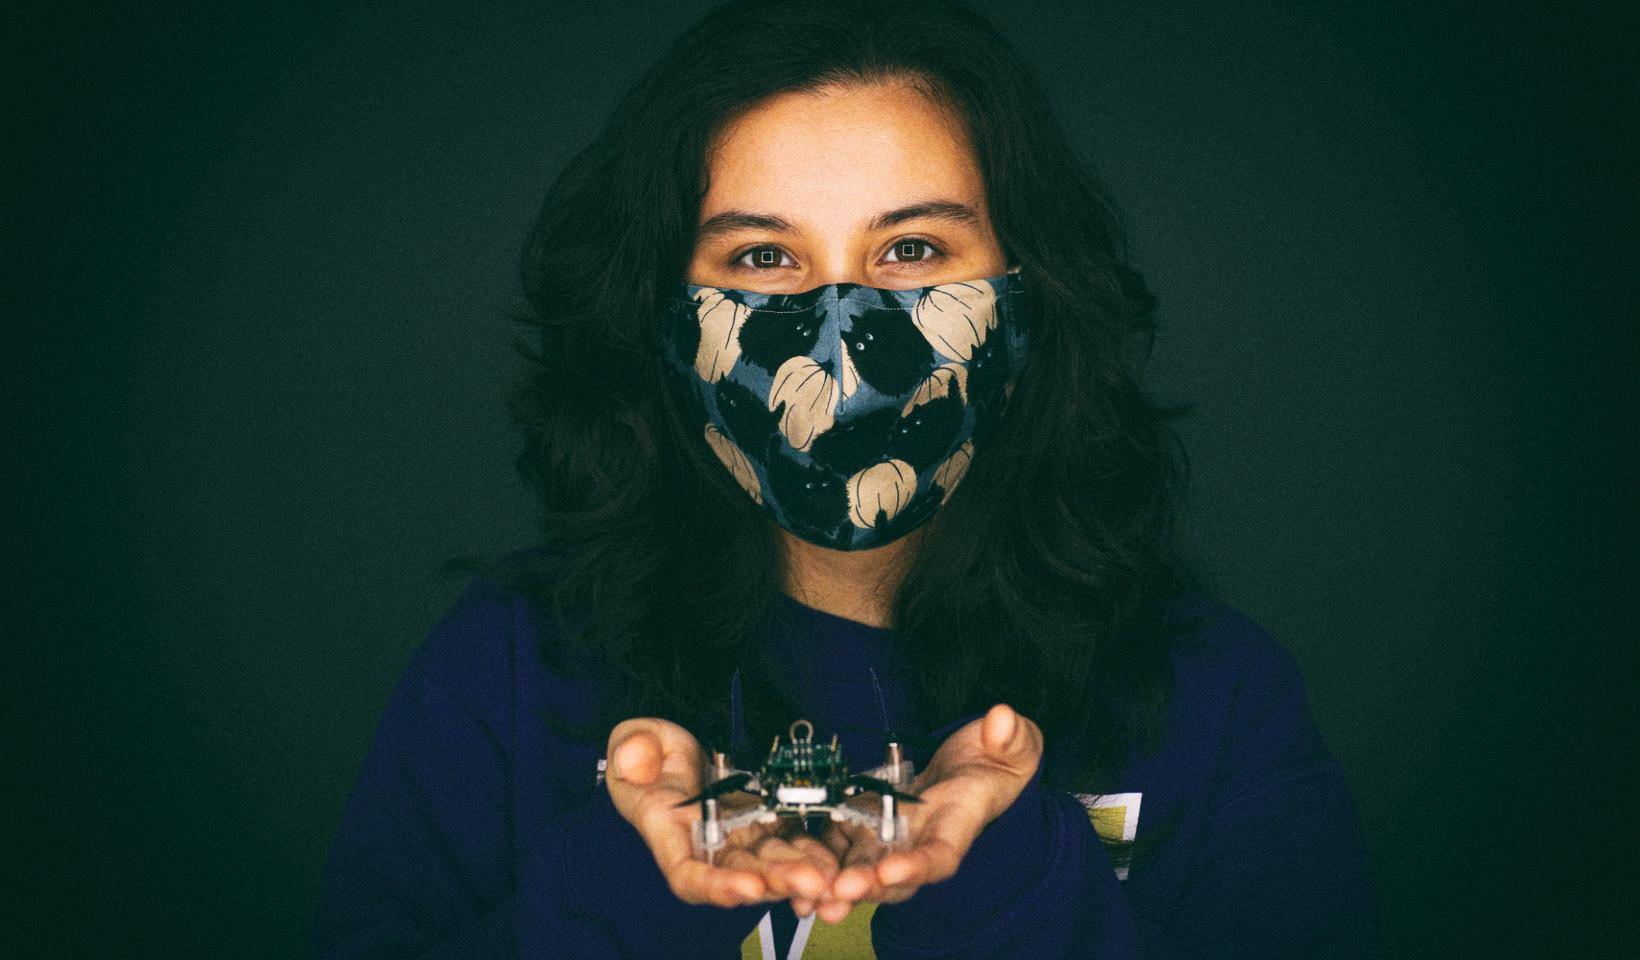 Создан дрон, который умеет чувствовать запахи